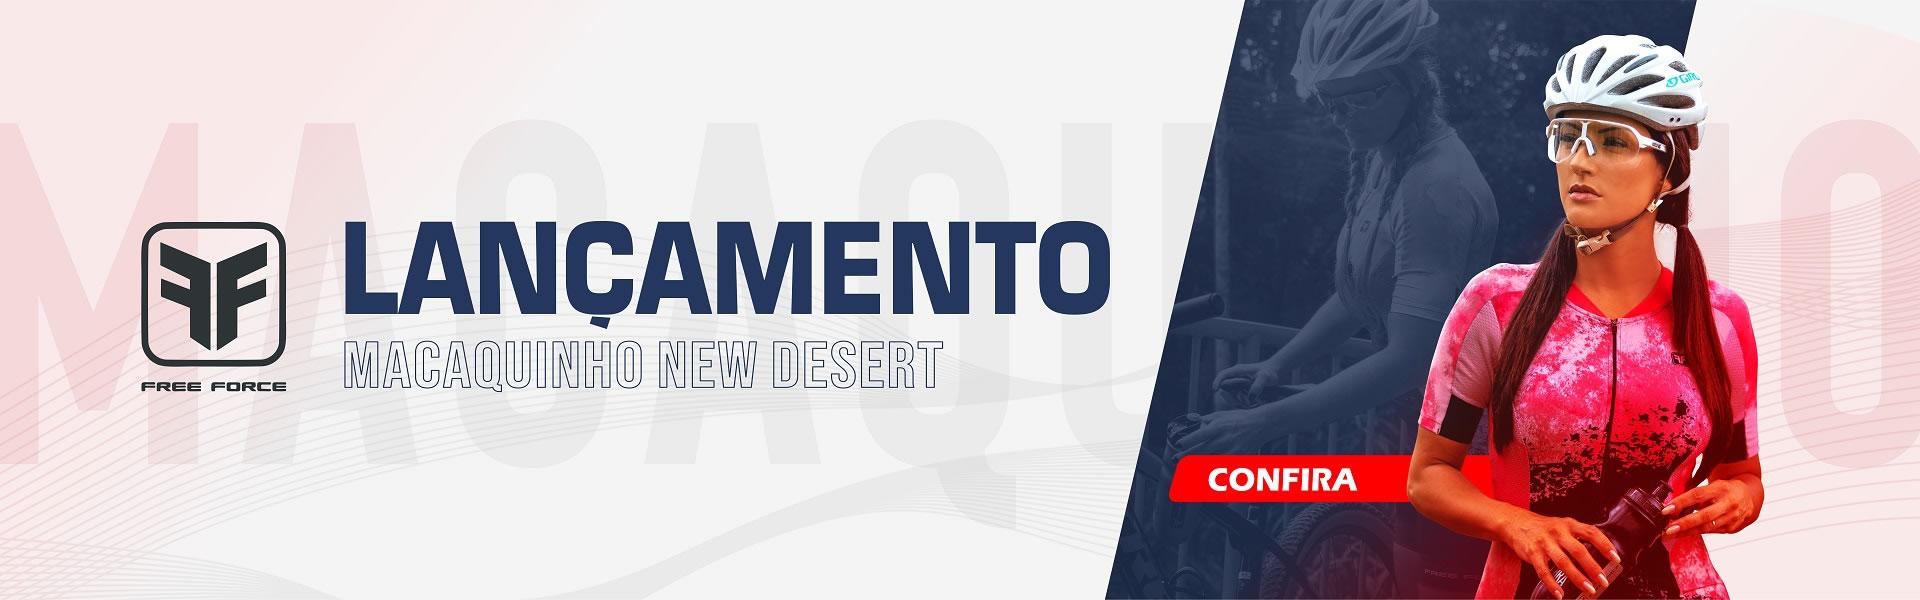 Banner desktop macaquinho new desert